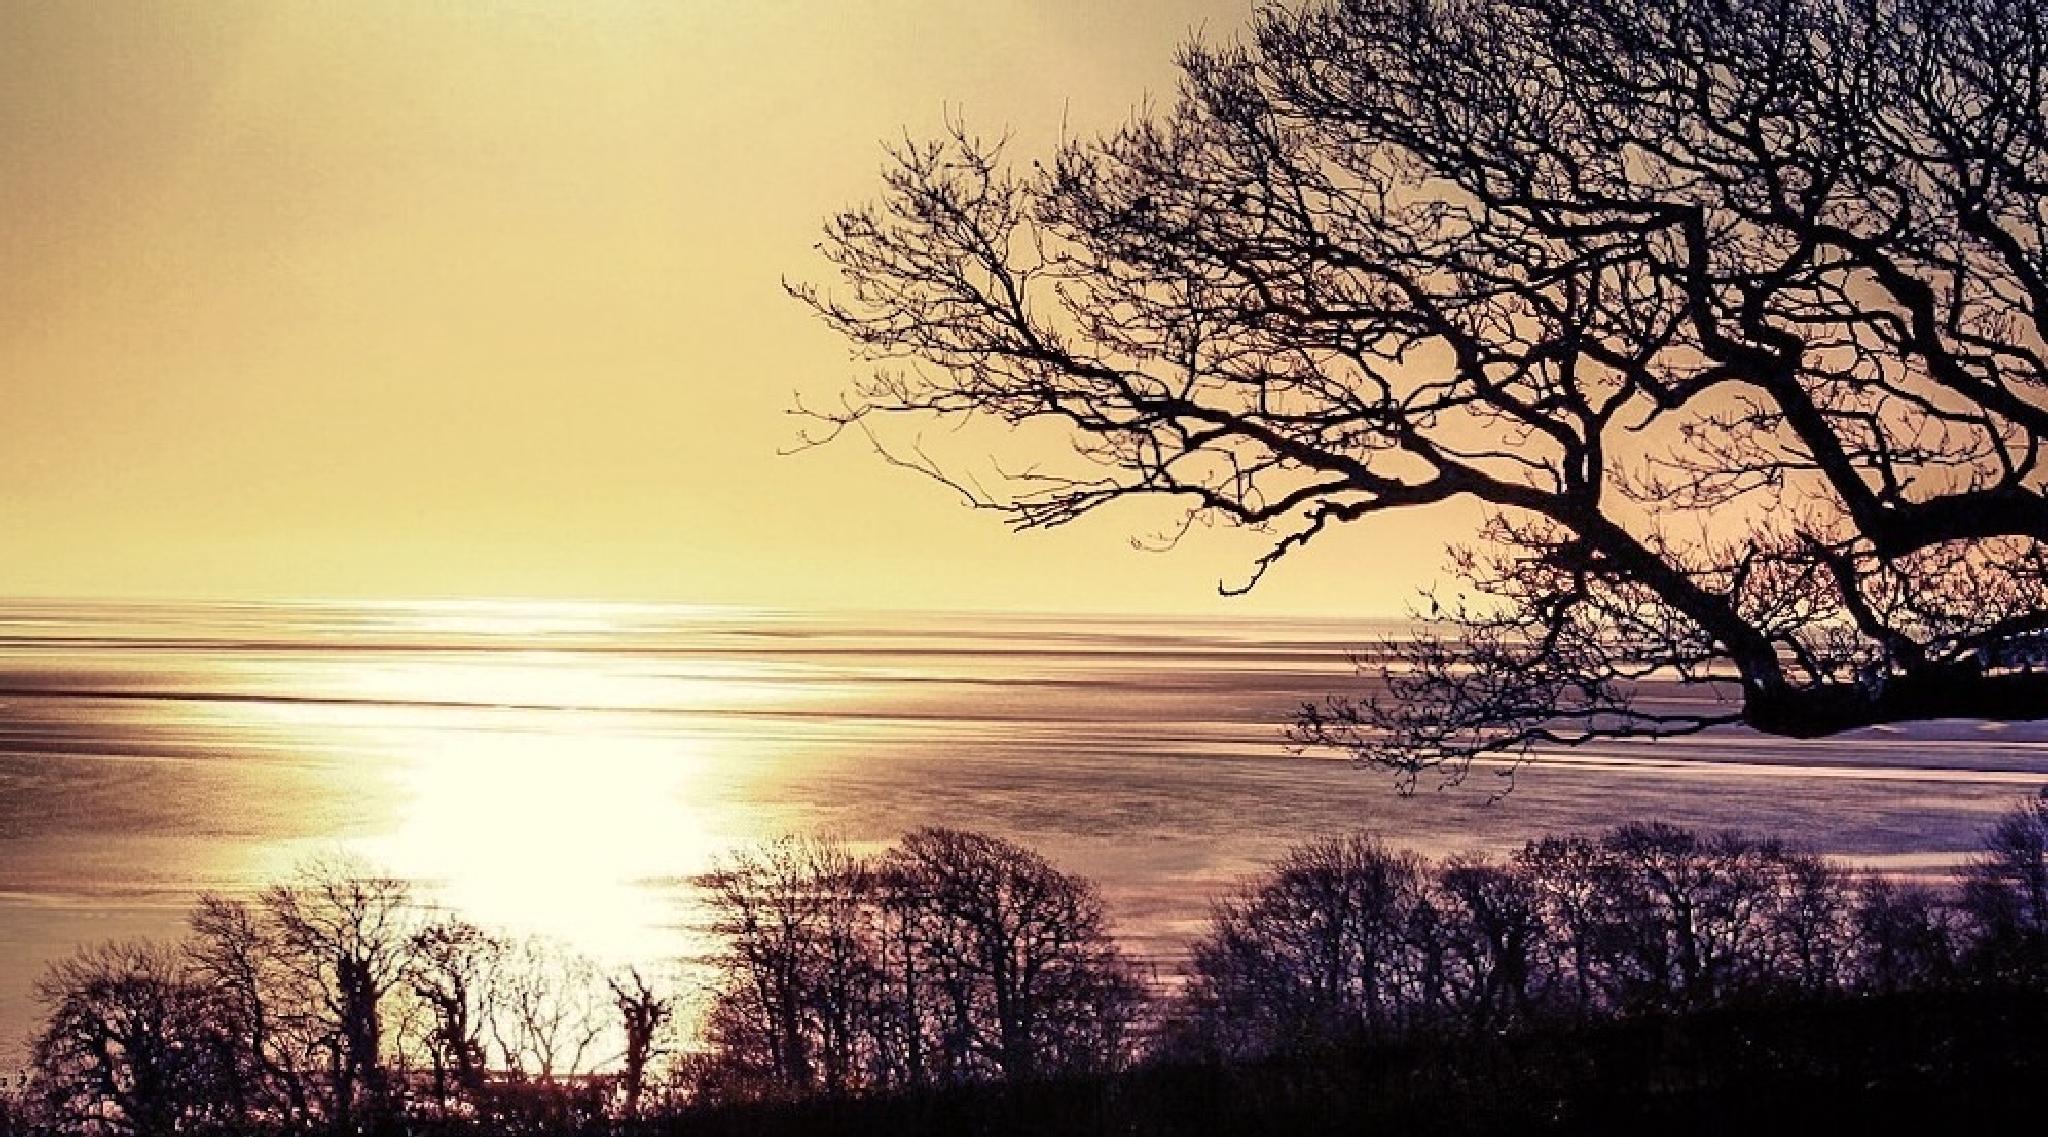 Sunrise over Morecambe Bay Cumbria... by Michael jjg